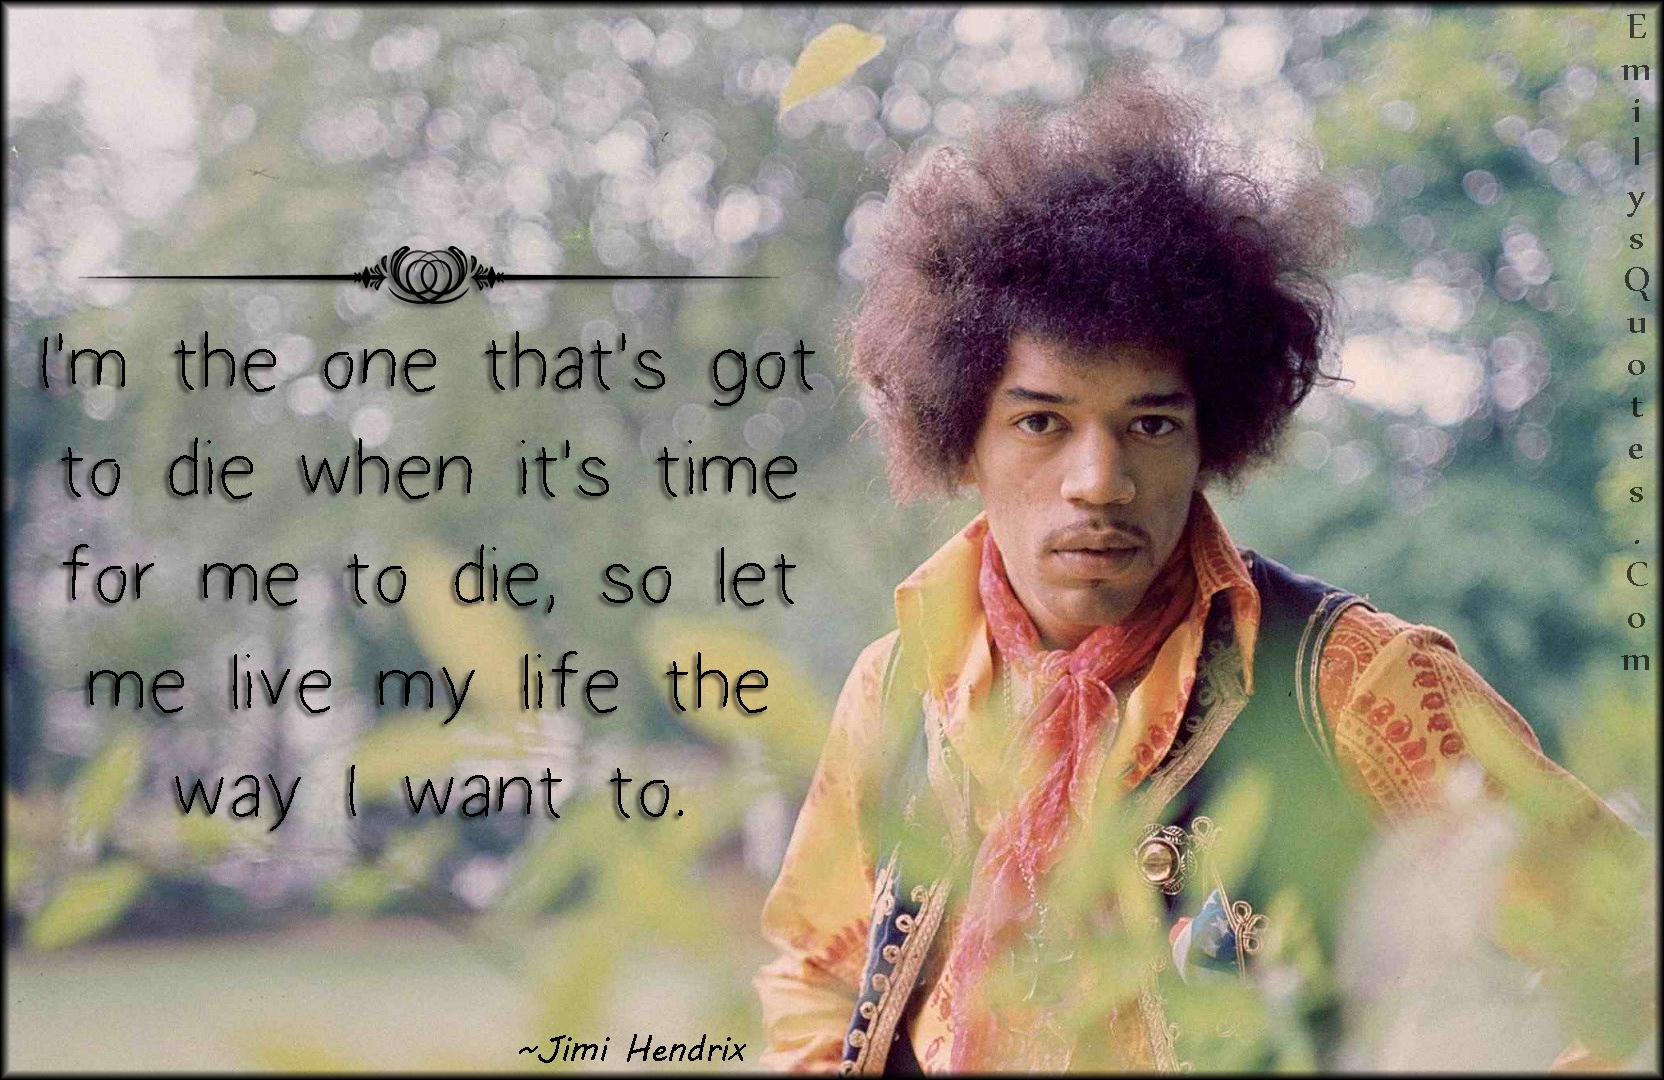 EmilysQuotes.Com - death, time, life, want, wisdom, decision, Jimi Hendrix